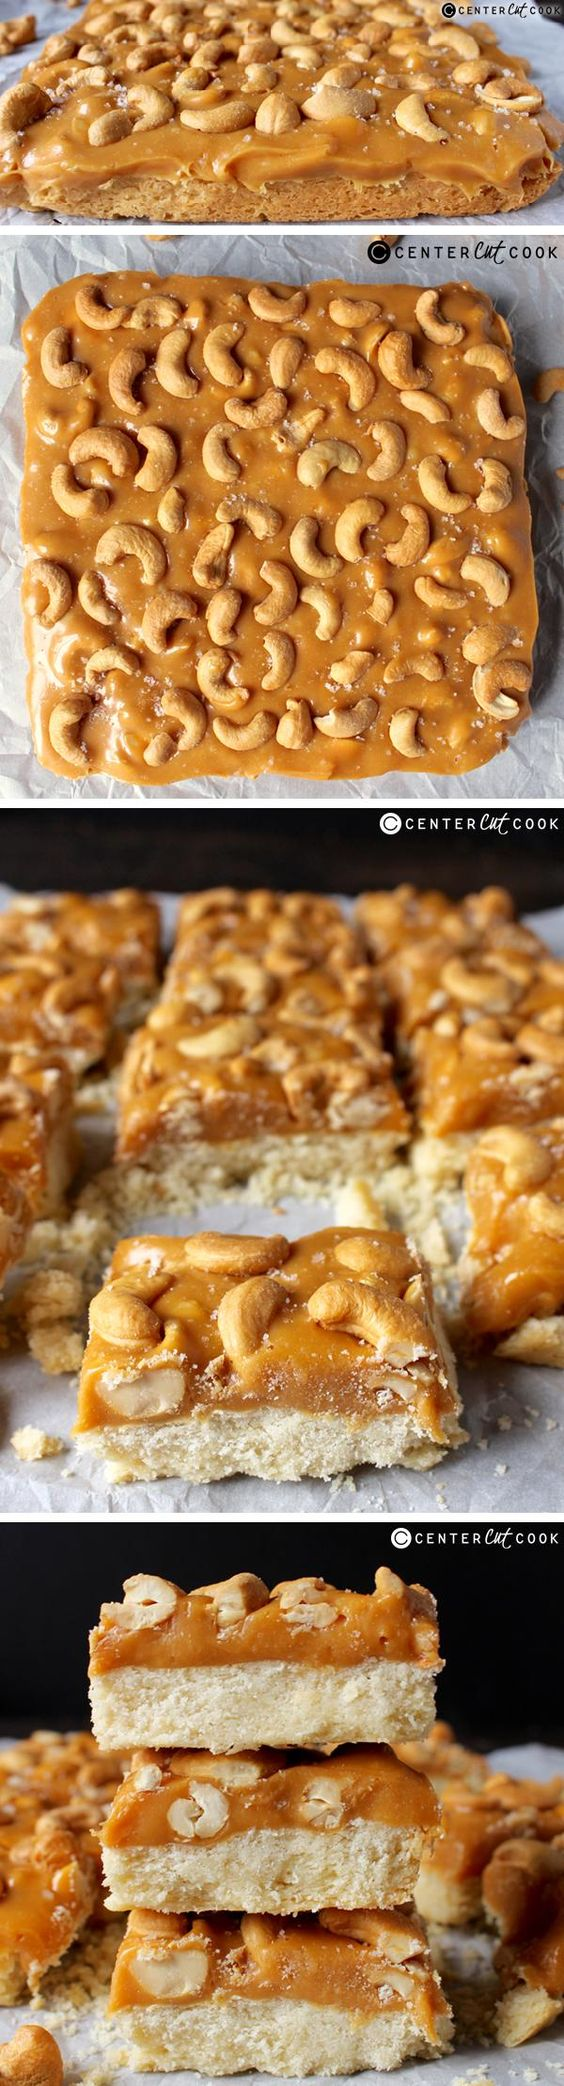 Caramel Cashew Bars | Recipe | Shortbread Crust, Caramel and Crusts